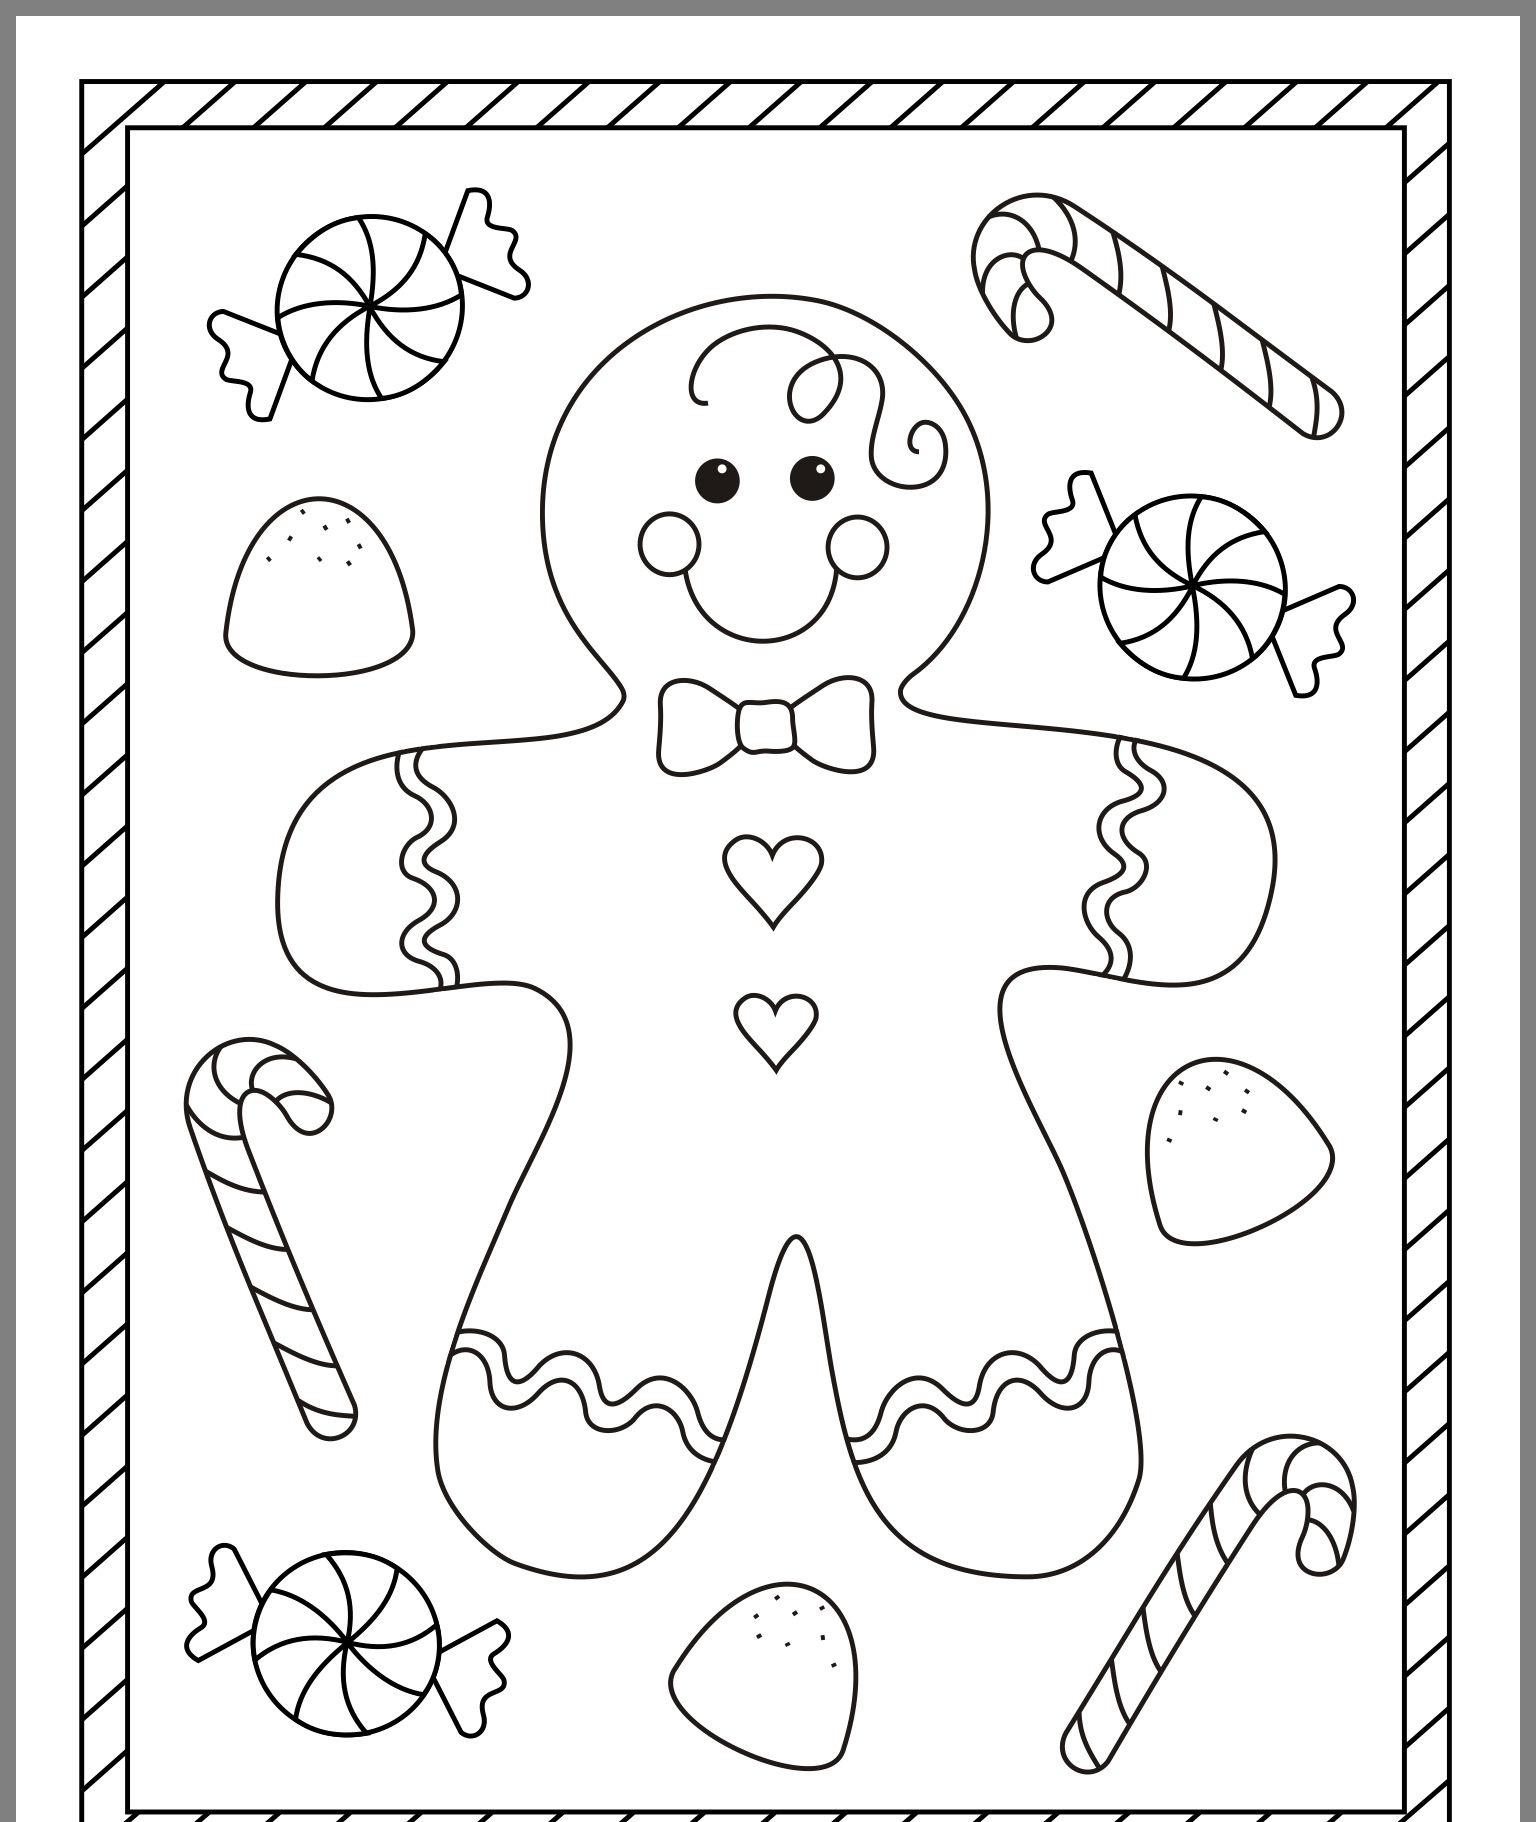 Pinsara Mcintyre On Christmas | Christmas Coloring Pages - Free Christmas Coloring Printables